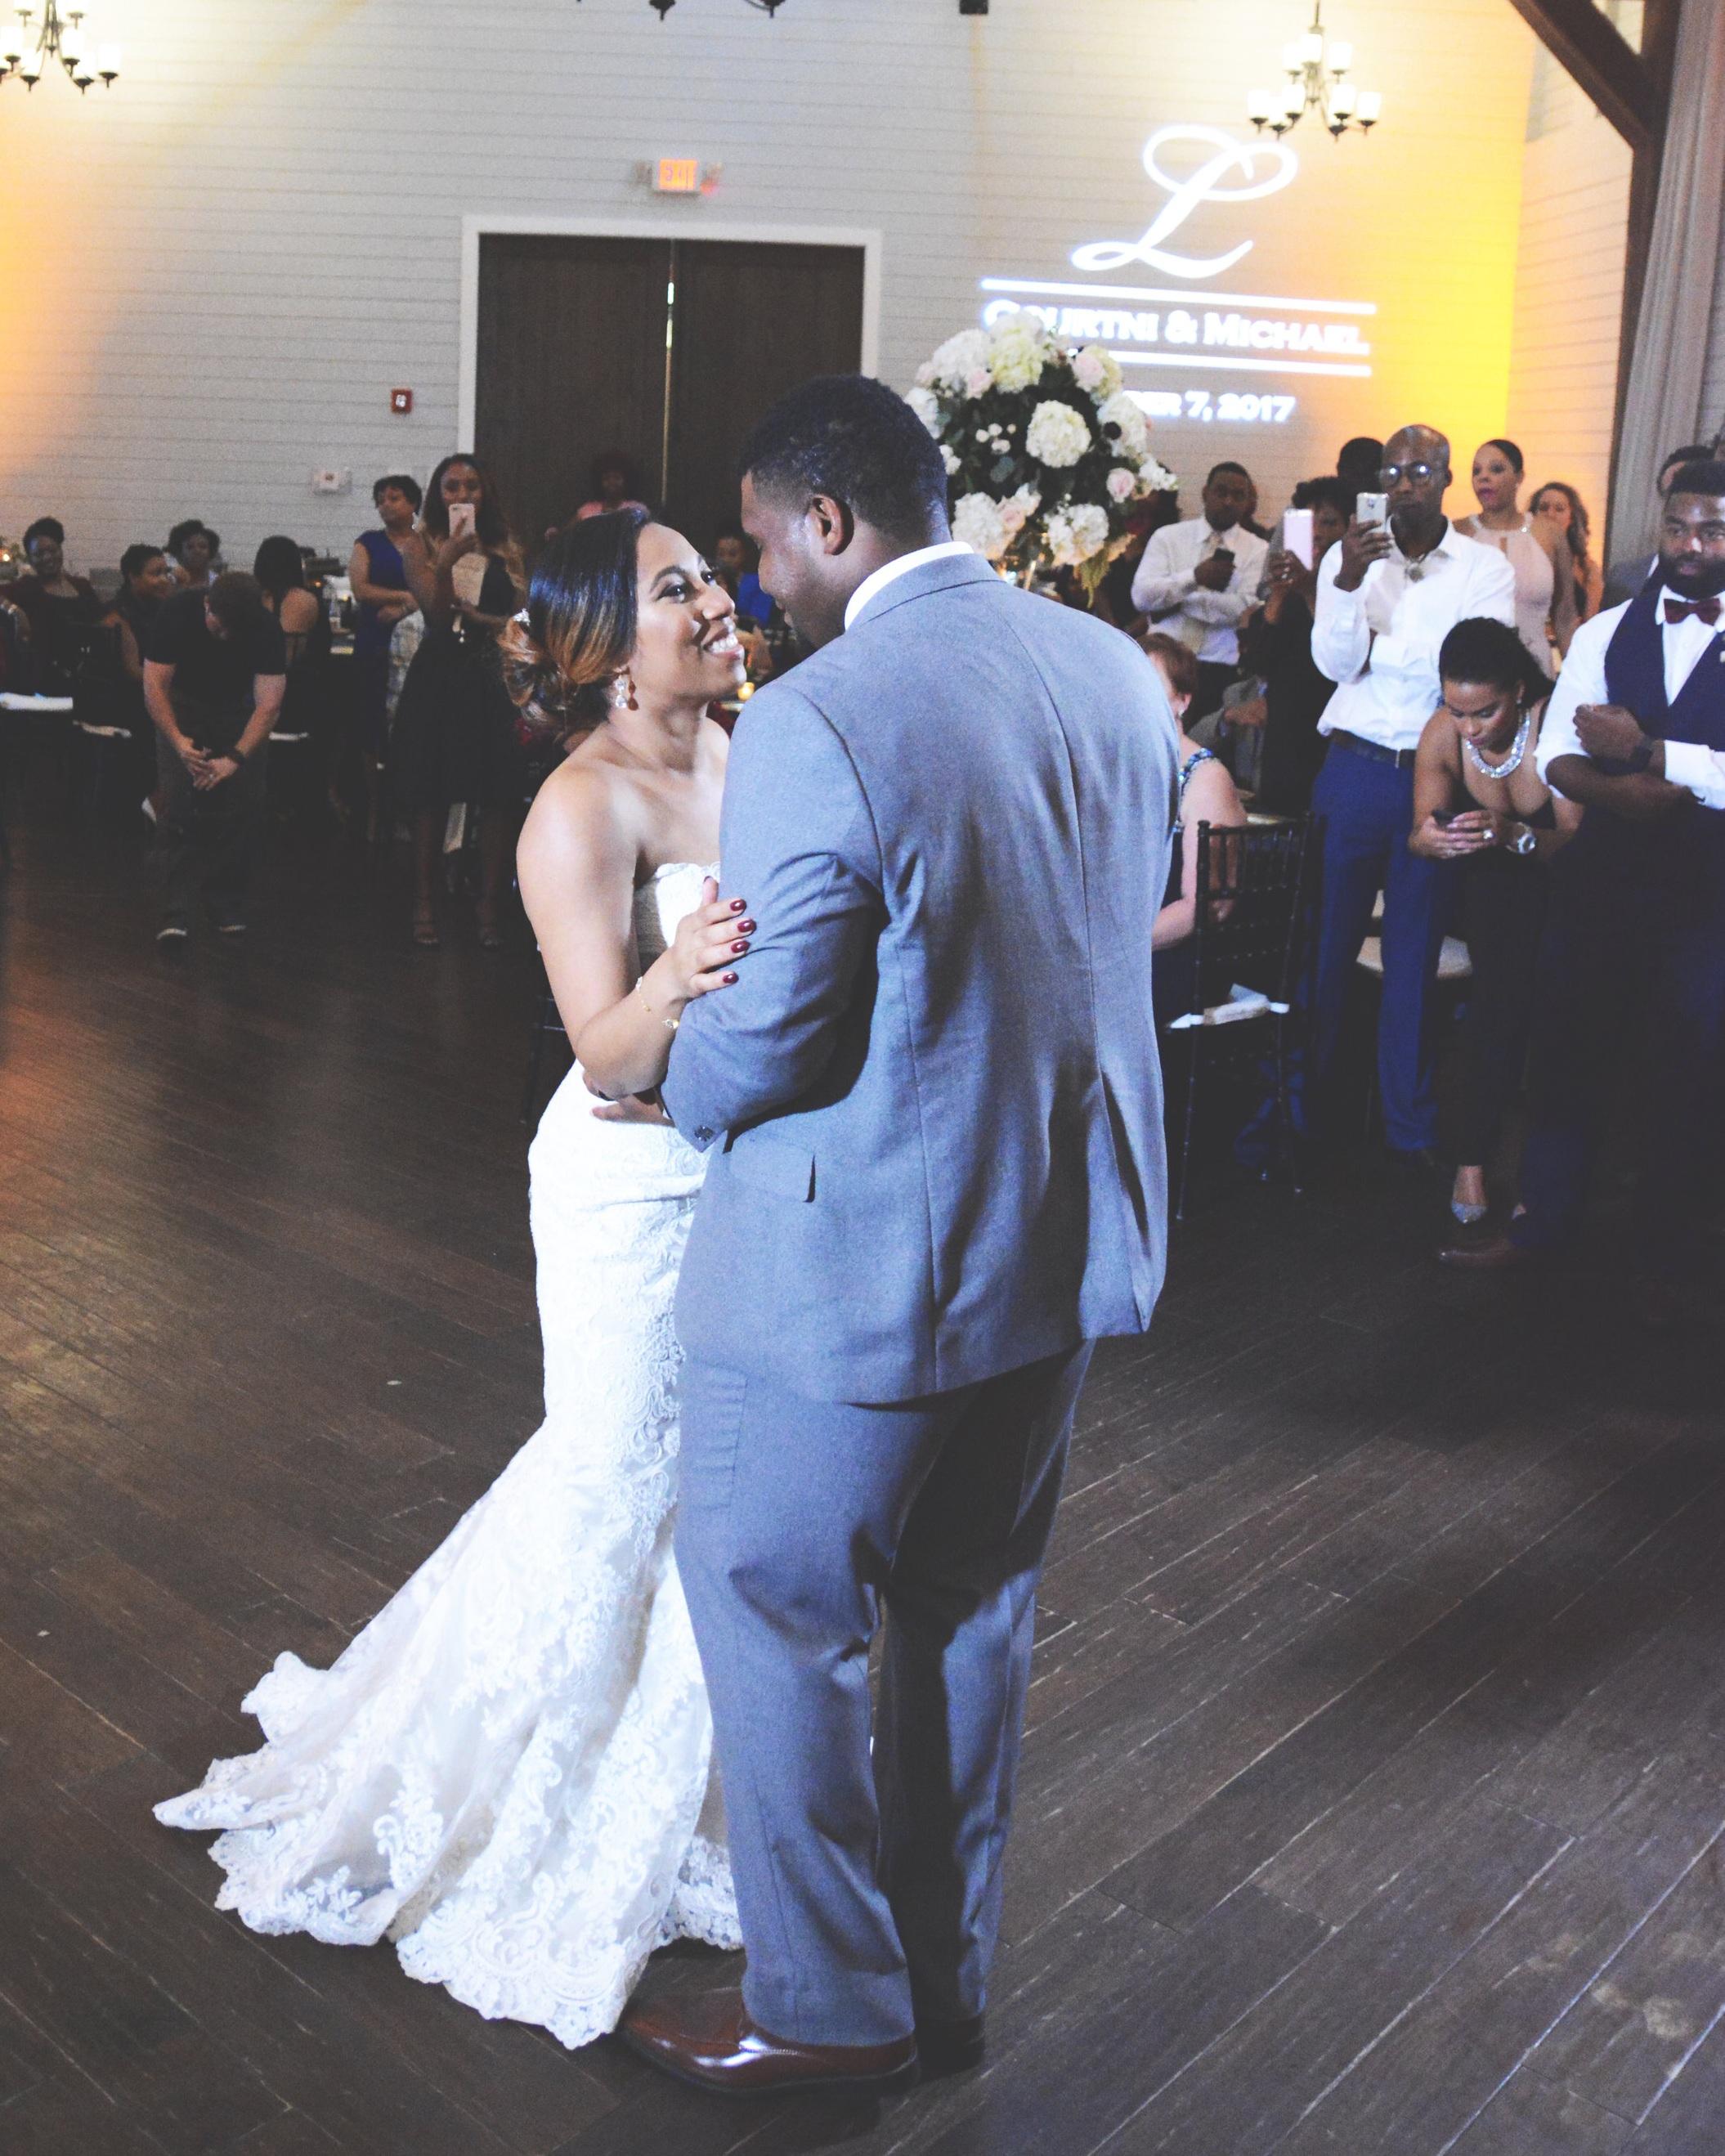 Foxhall+Resort+Wedding+Photography+-+Six+Hearts+Photography1681.jpg